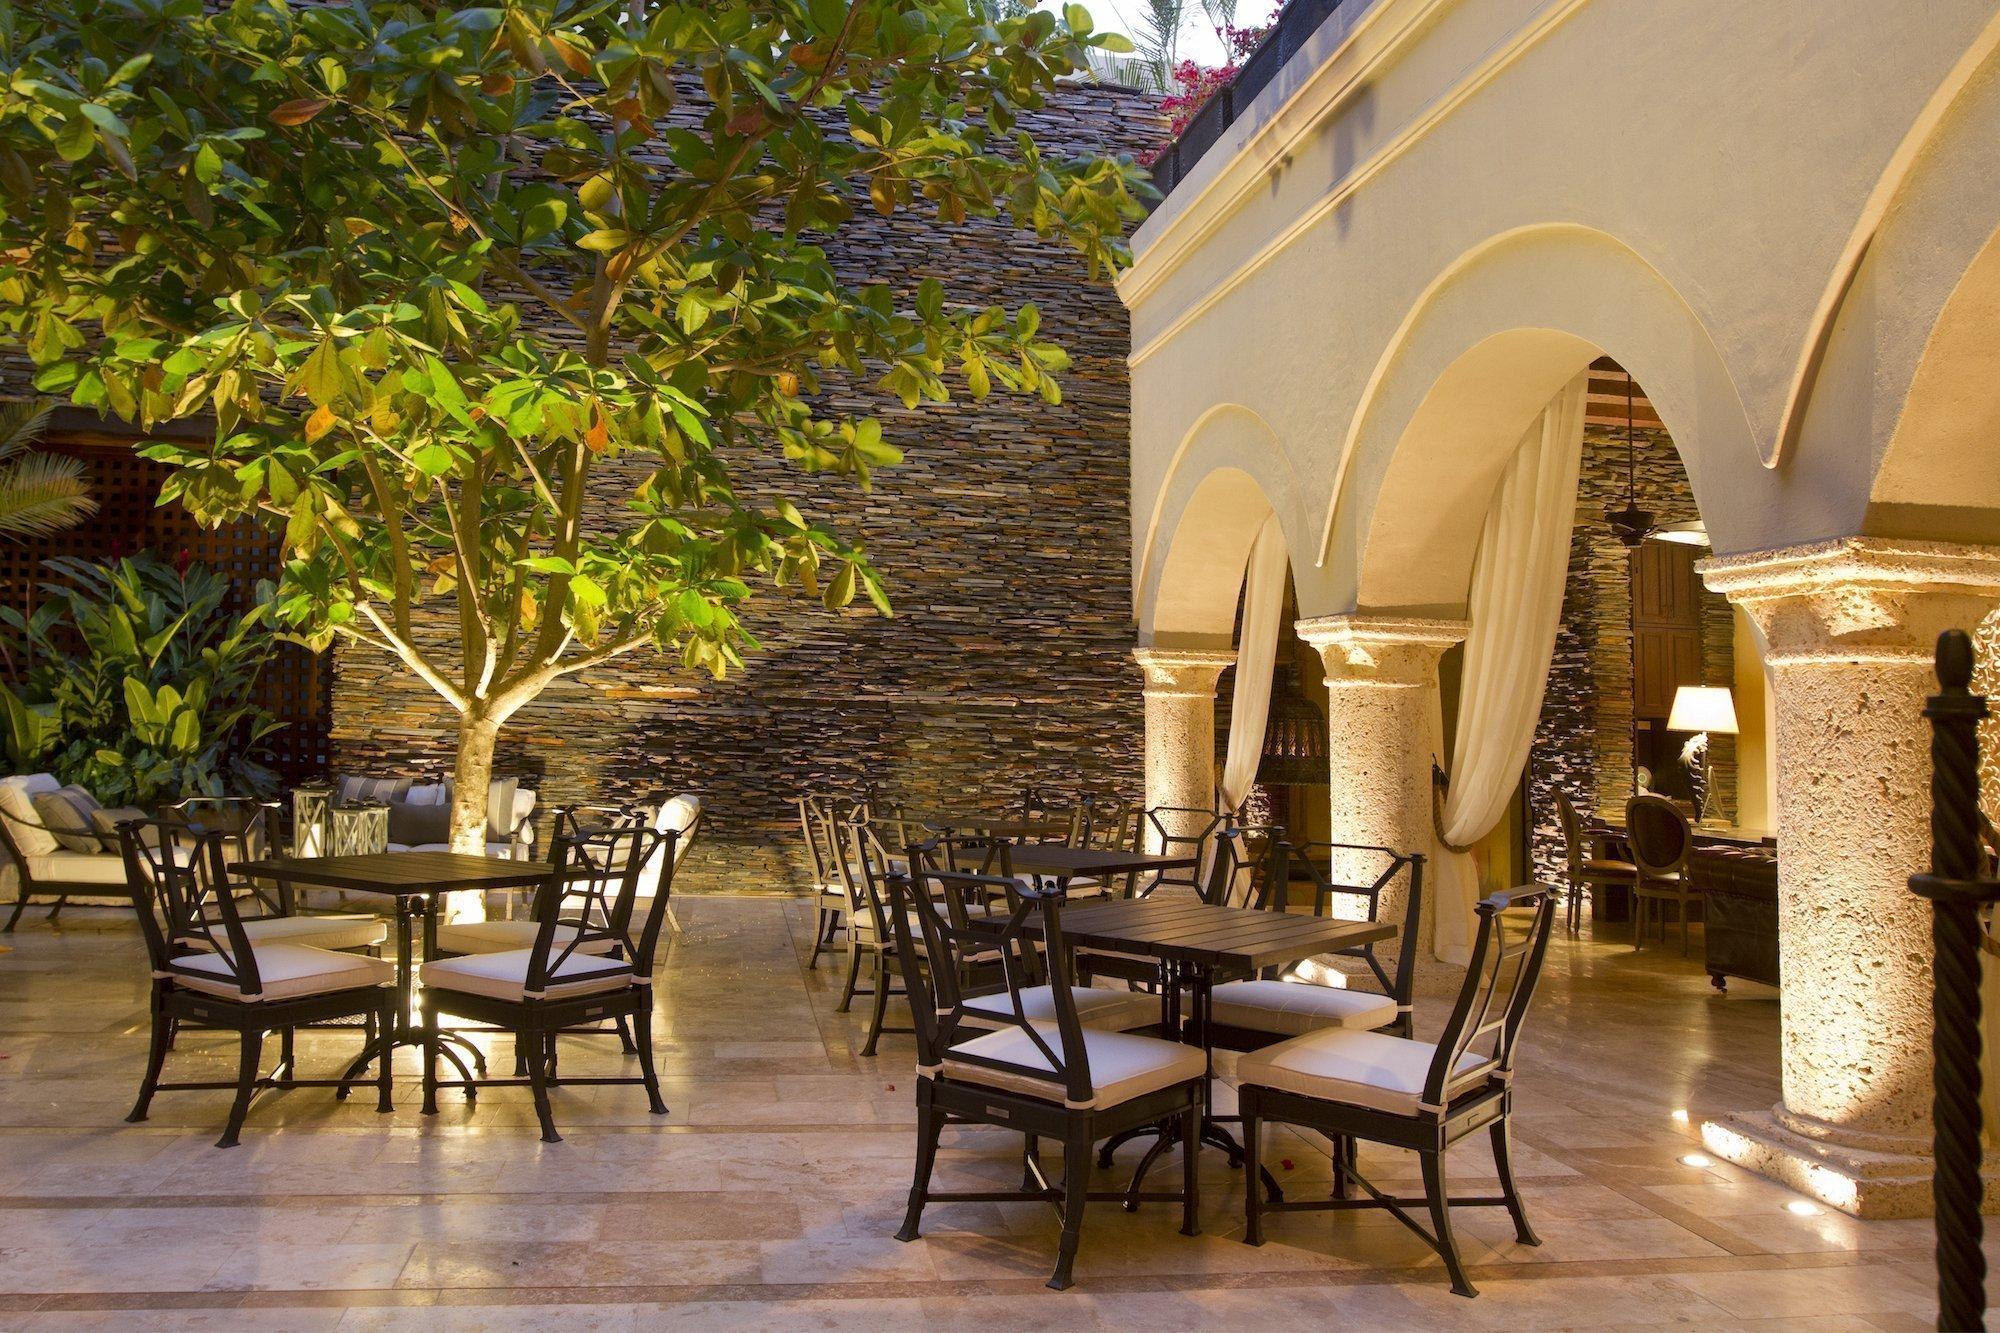 Bastión Luxury Hotel Restaurants, Official Website